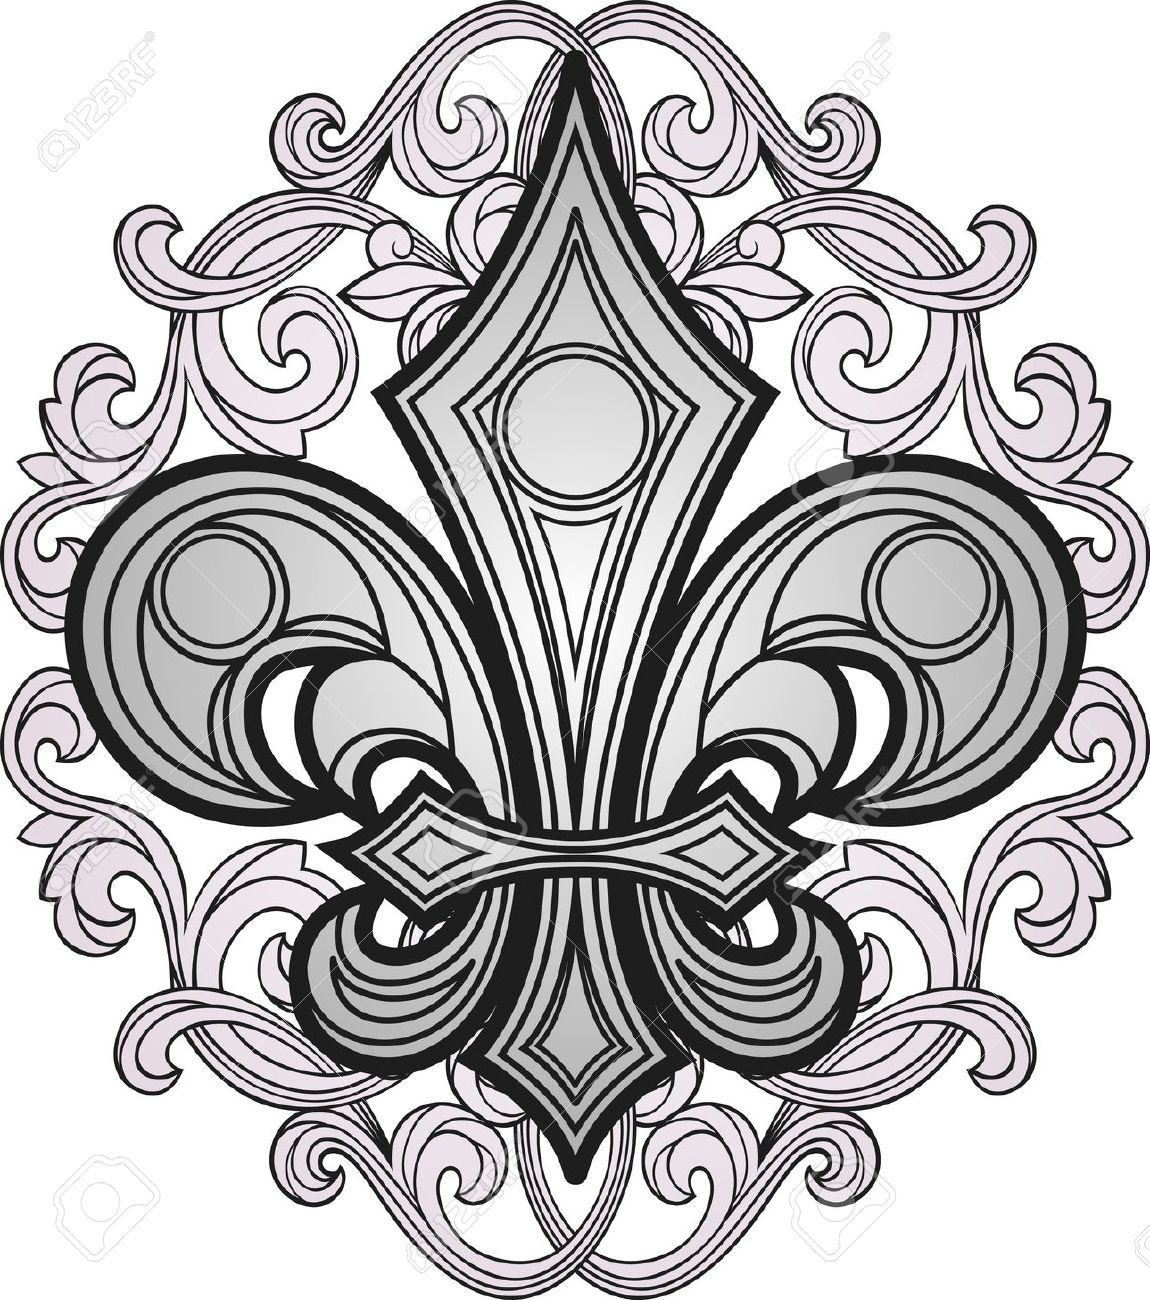 Printable Fleur De Lis Graphics Free Google Search Cover Up Tattoo Art Clip Art